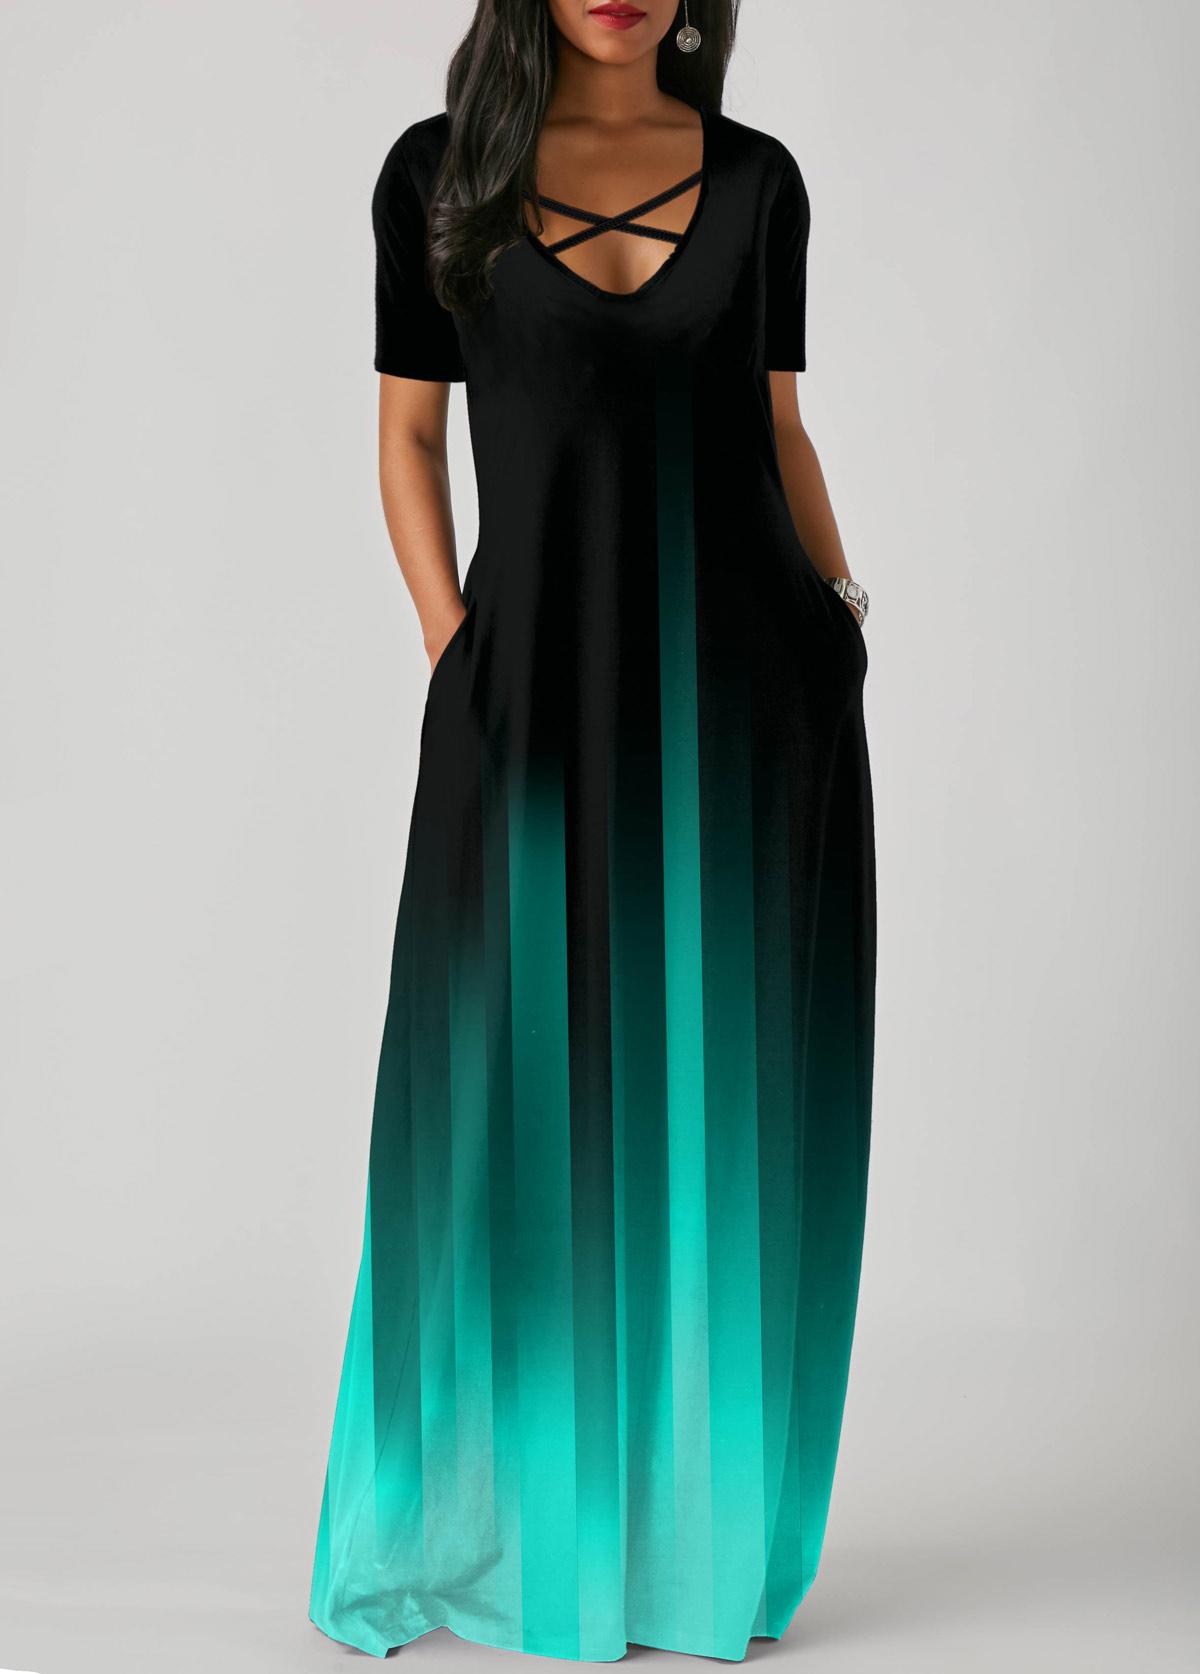 Side Pocket Short Sleeve Mint Green Gradient Maxi Dress